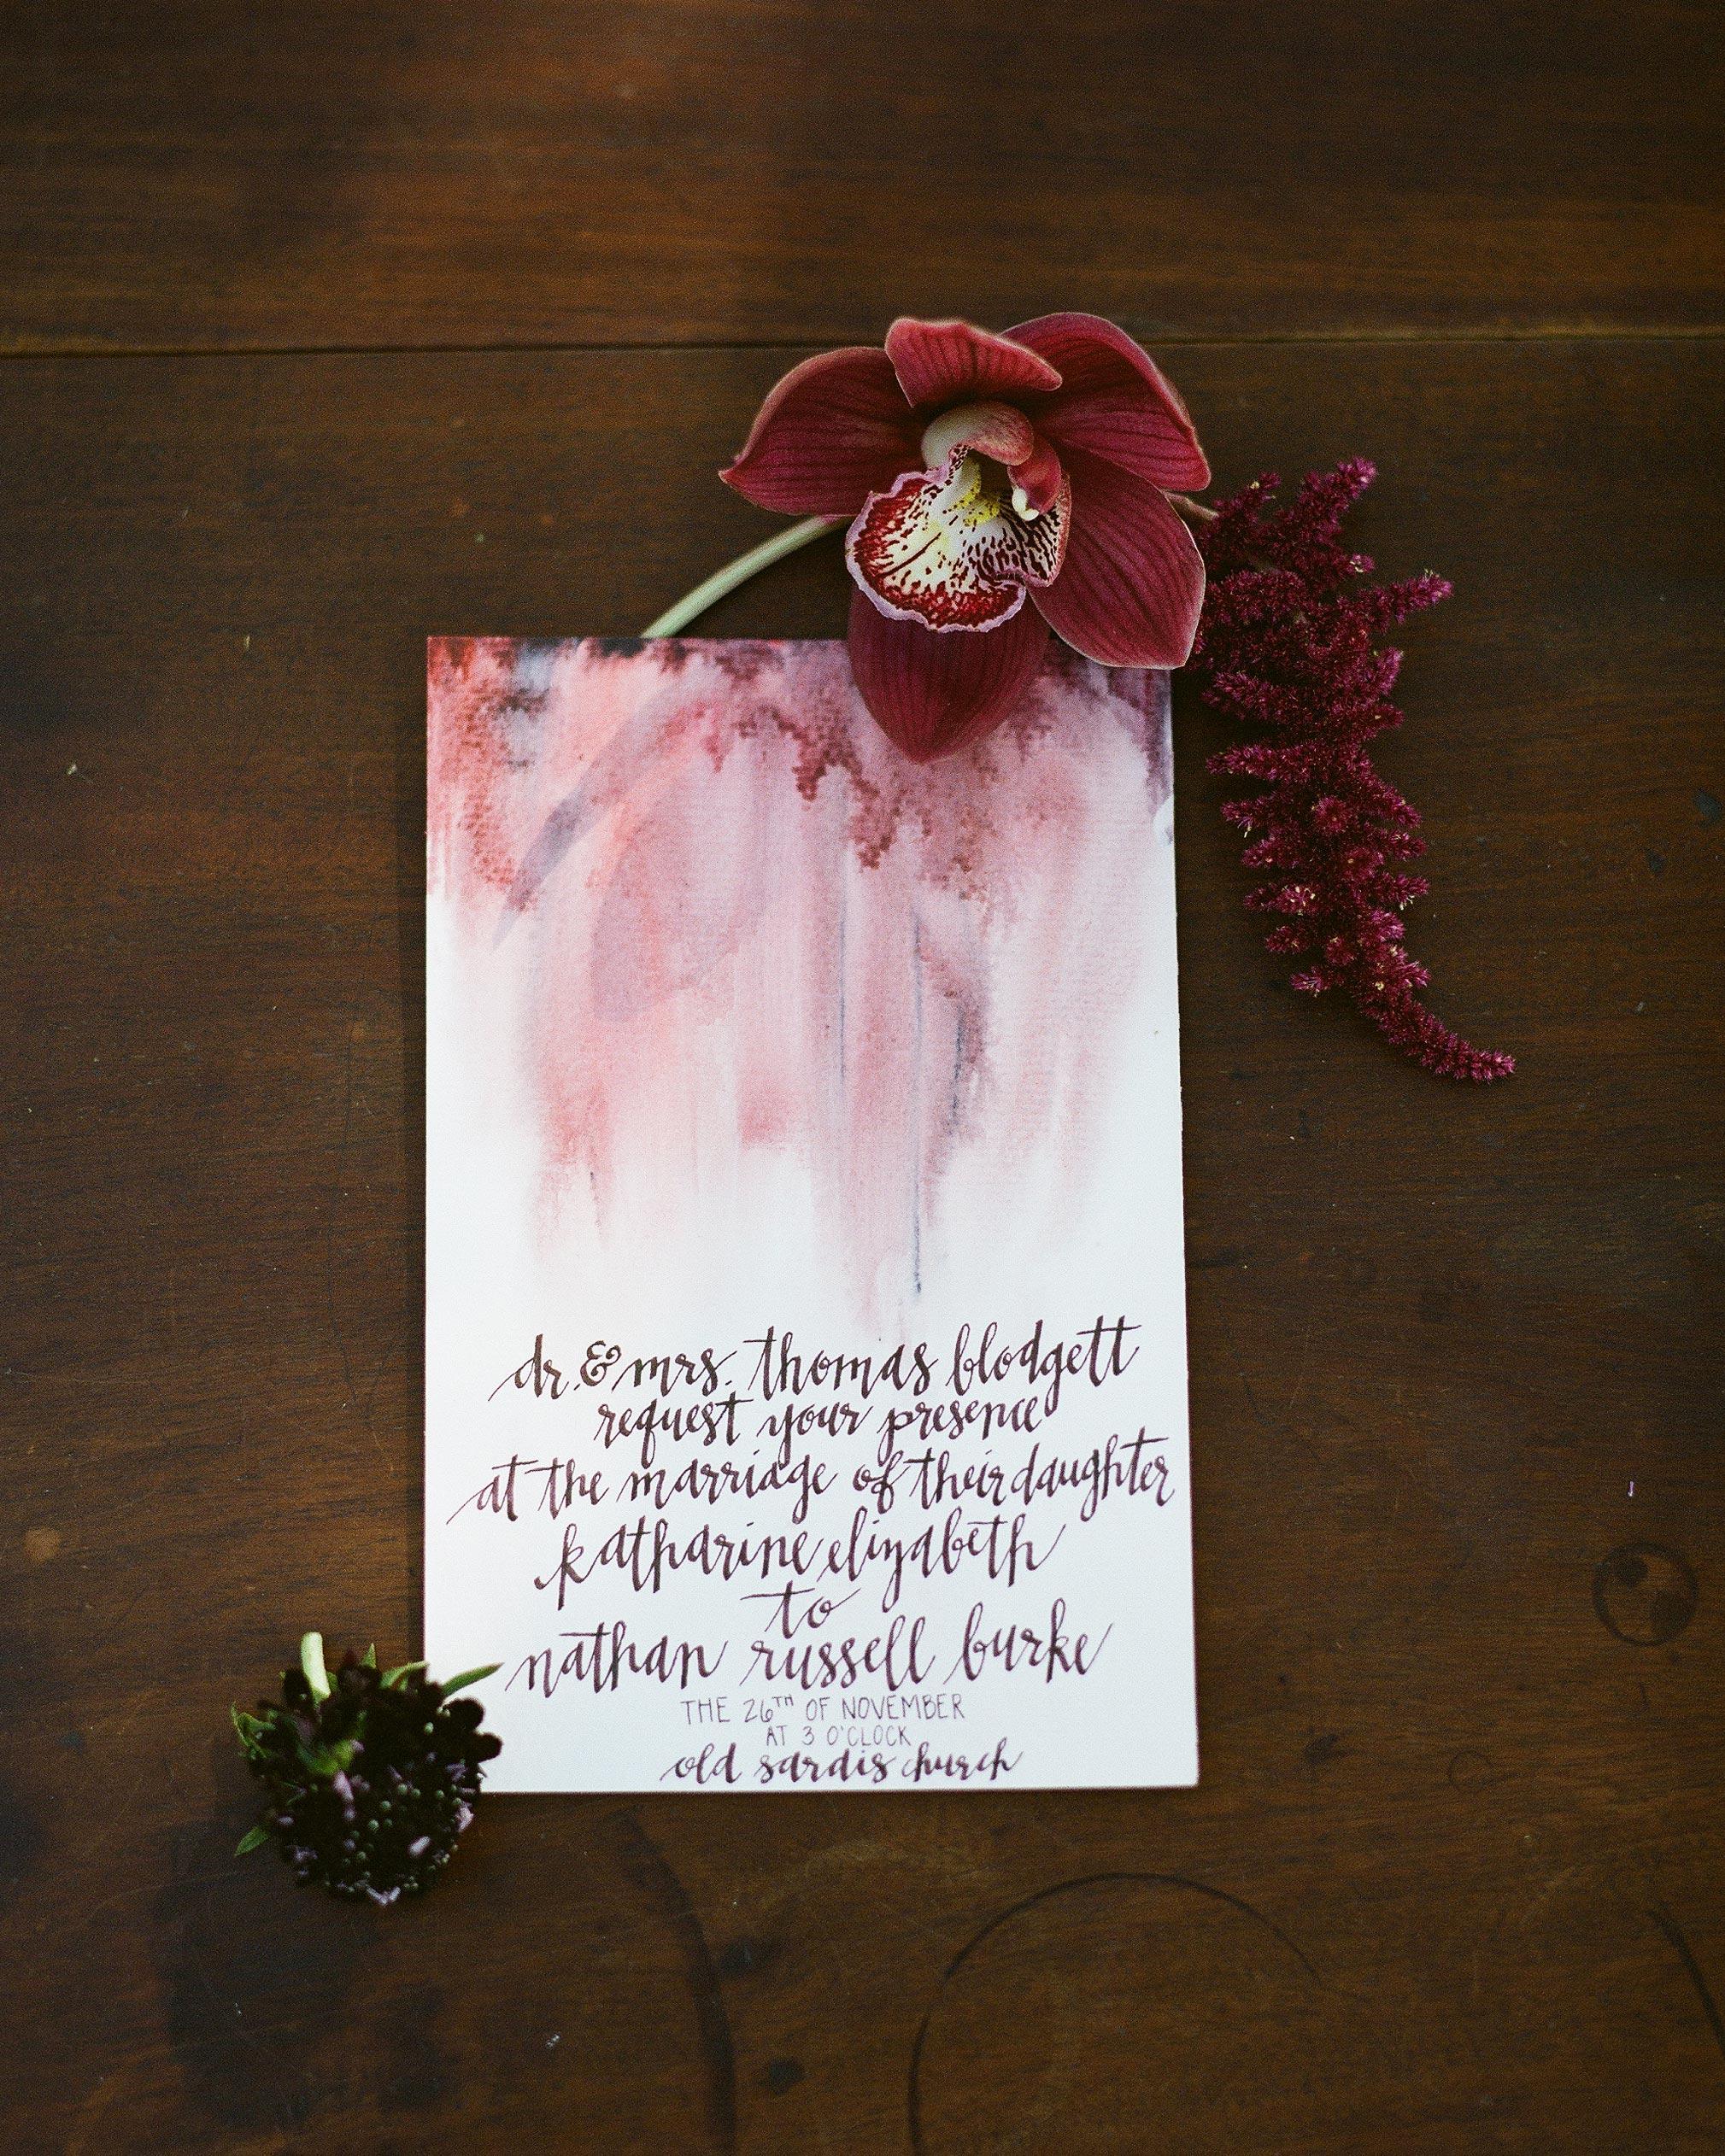 katie-nathan-wedding-thanksgiving-invite-055-s113017.jpg